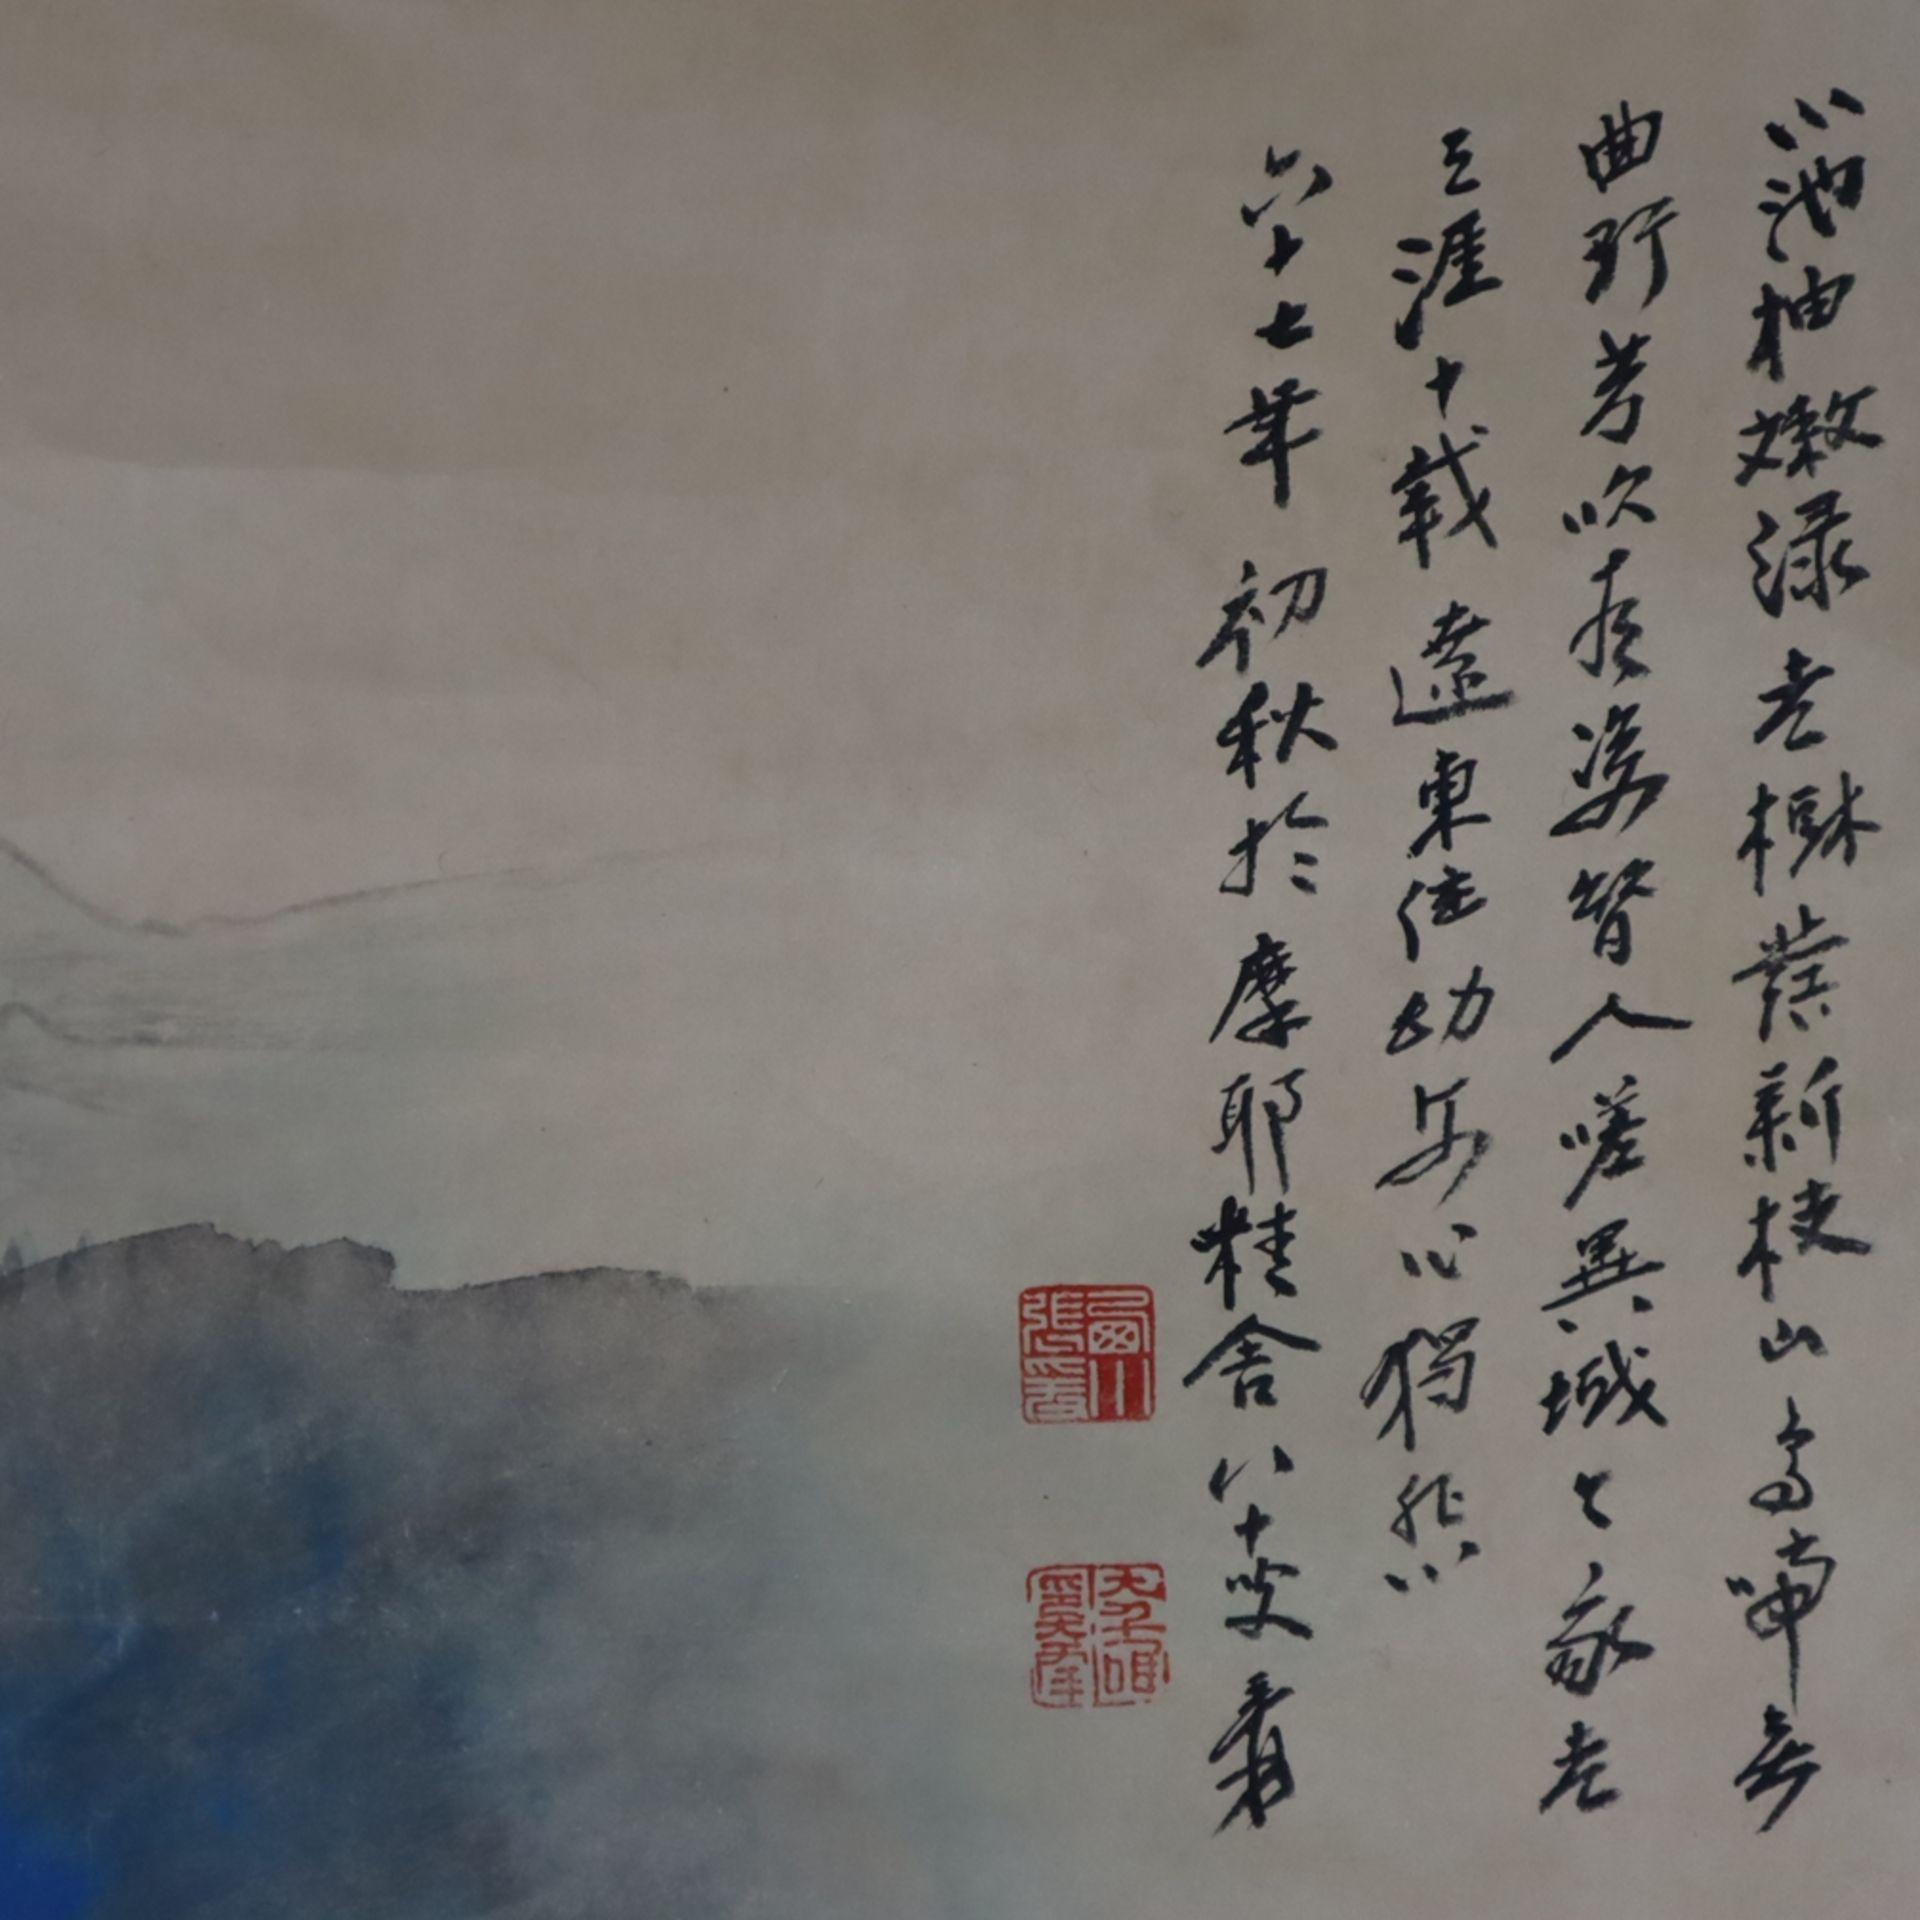 Chinesisches Rollbild - gesiegelt Zhang Daqian (   Chinese Hanging Scroll - sealed Zhang Daqian (18 - Image 14 of 18